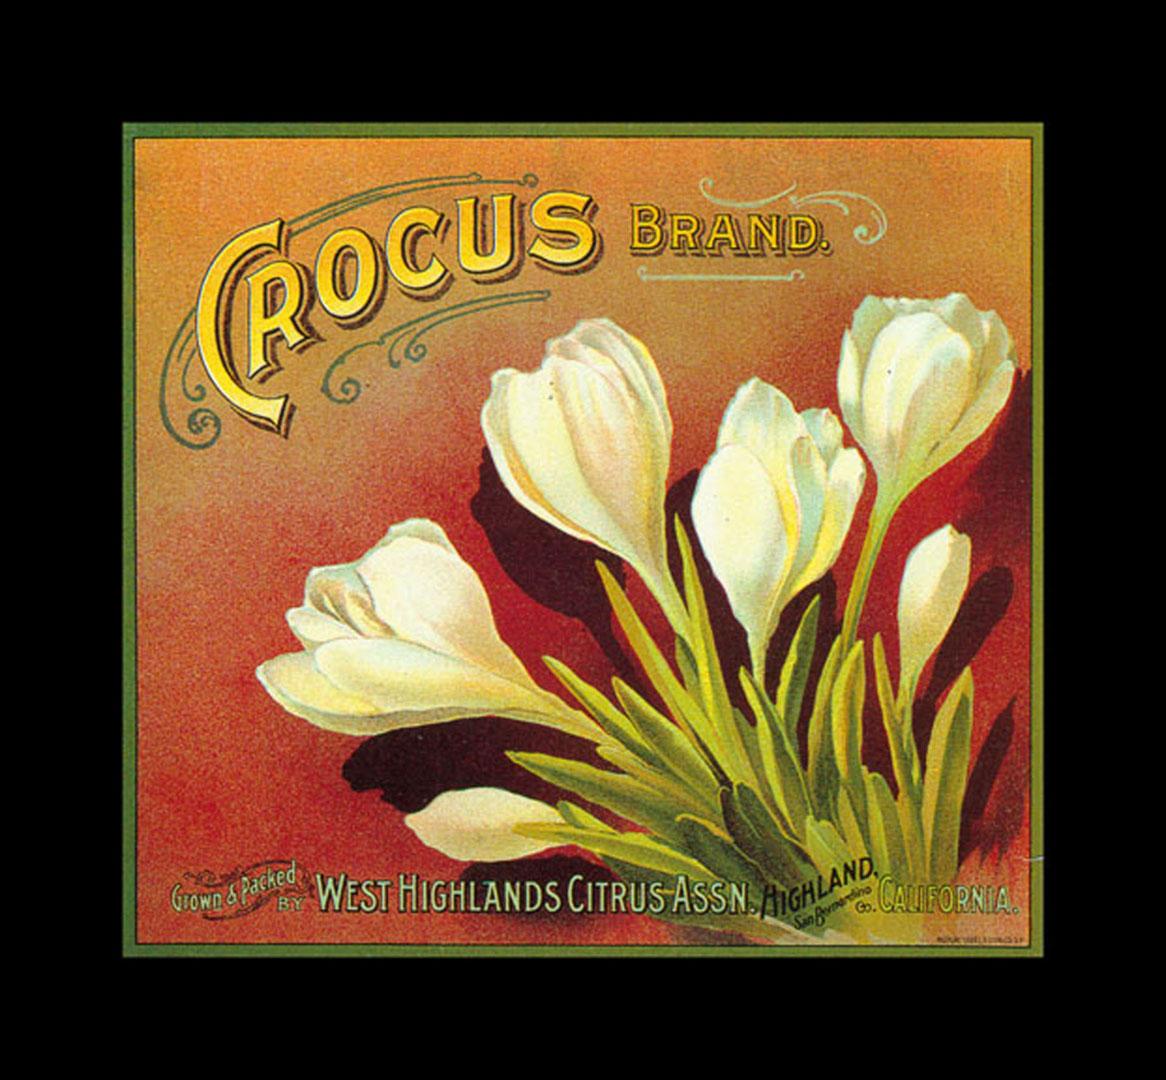 Crocus Brand Oranges   Vintage Fruit Crate Labels Wallpaper Image 1166x1080